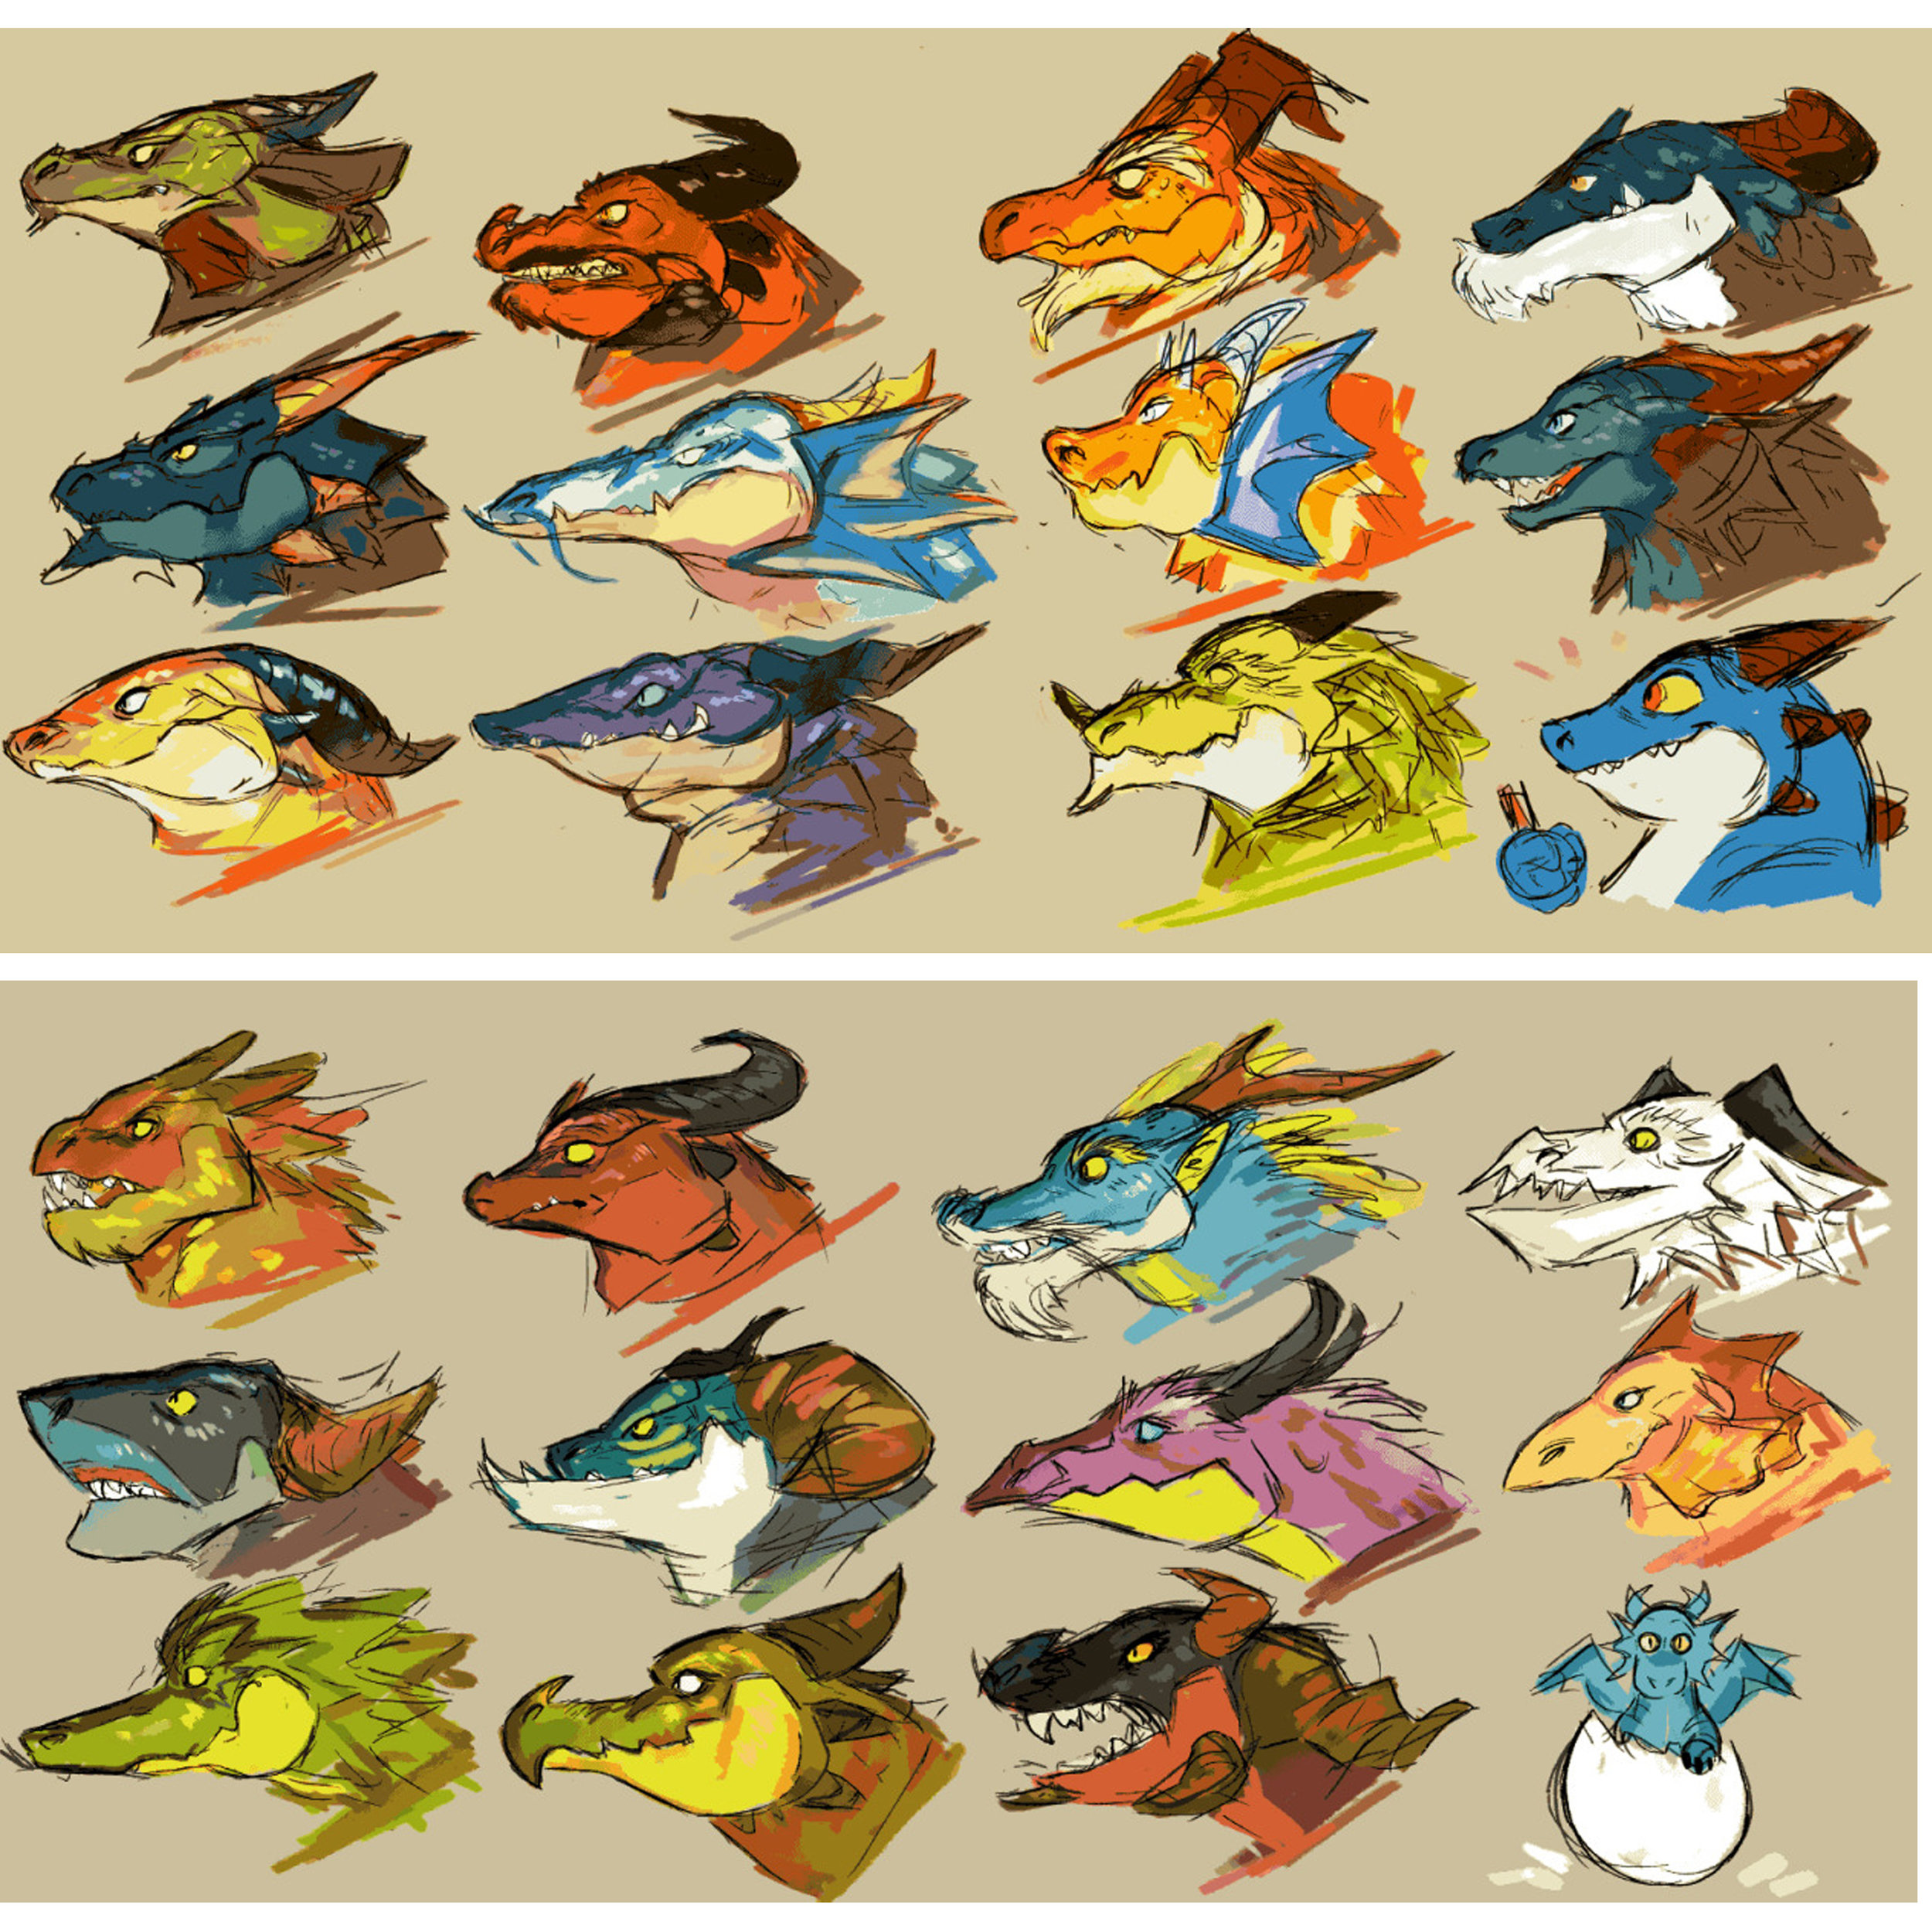 dragons1.jpg